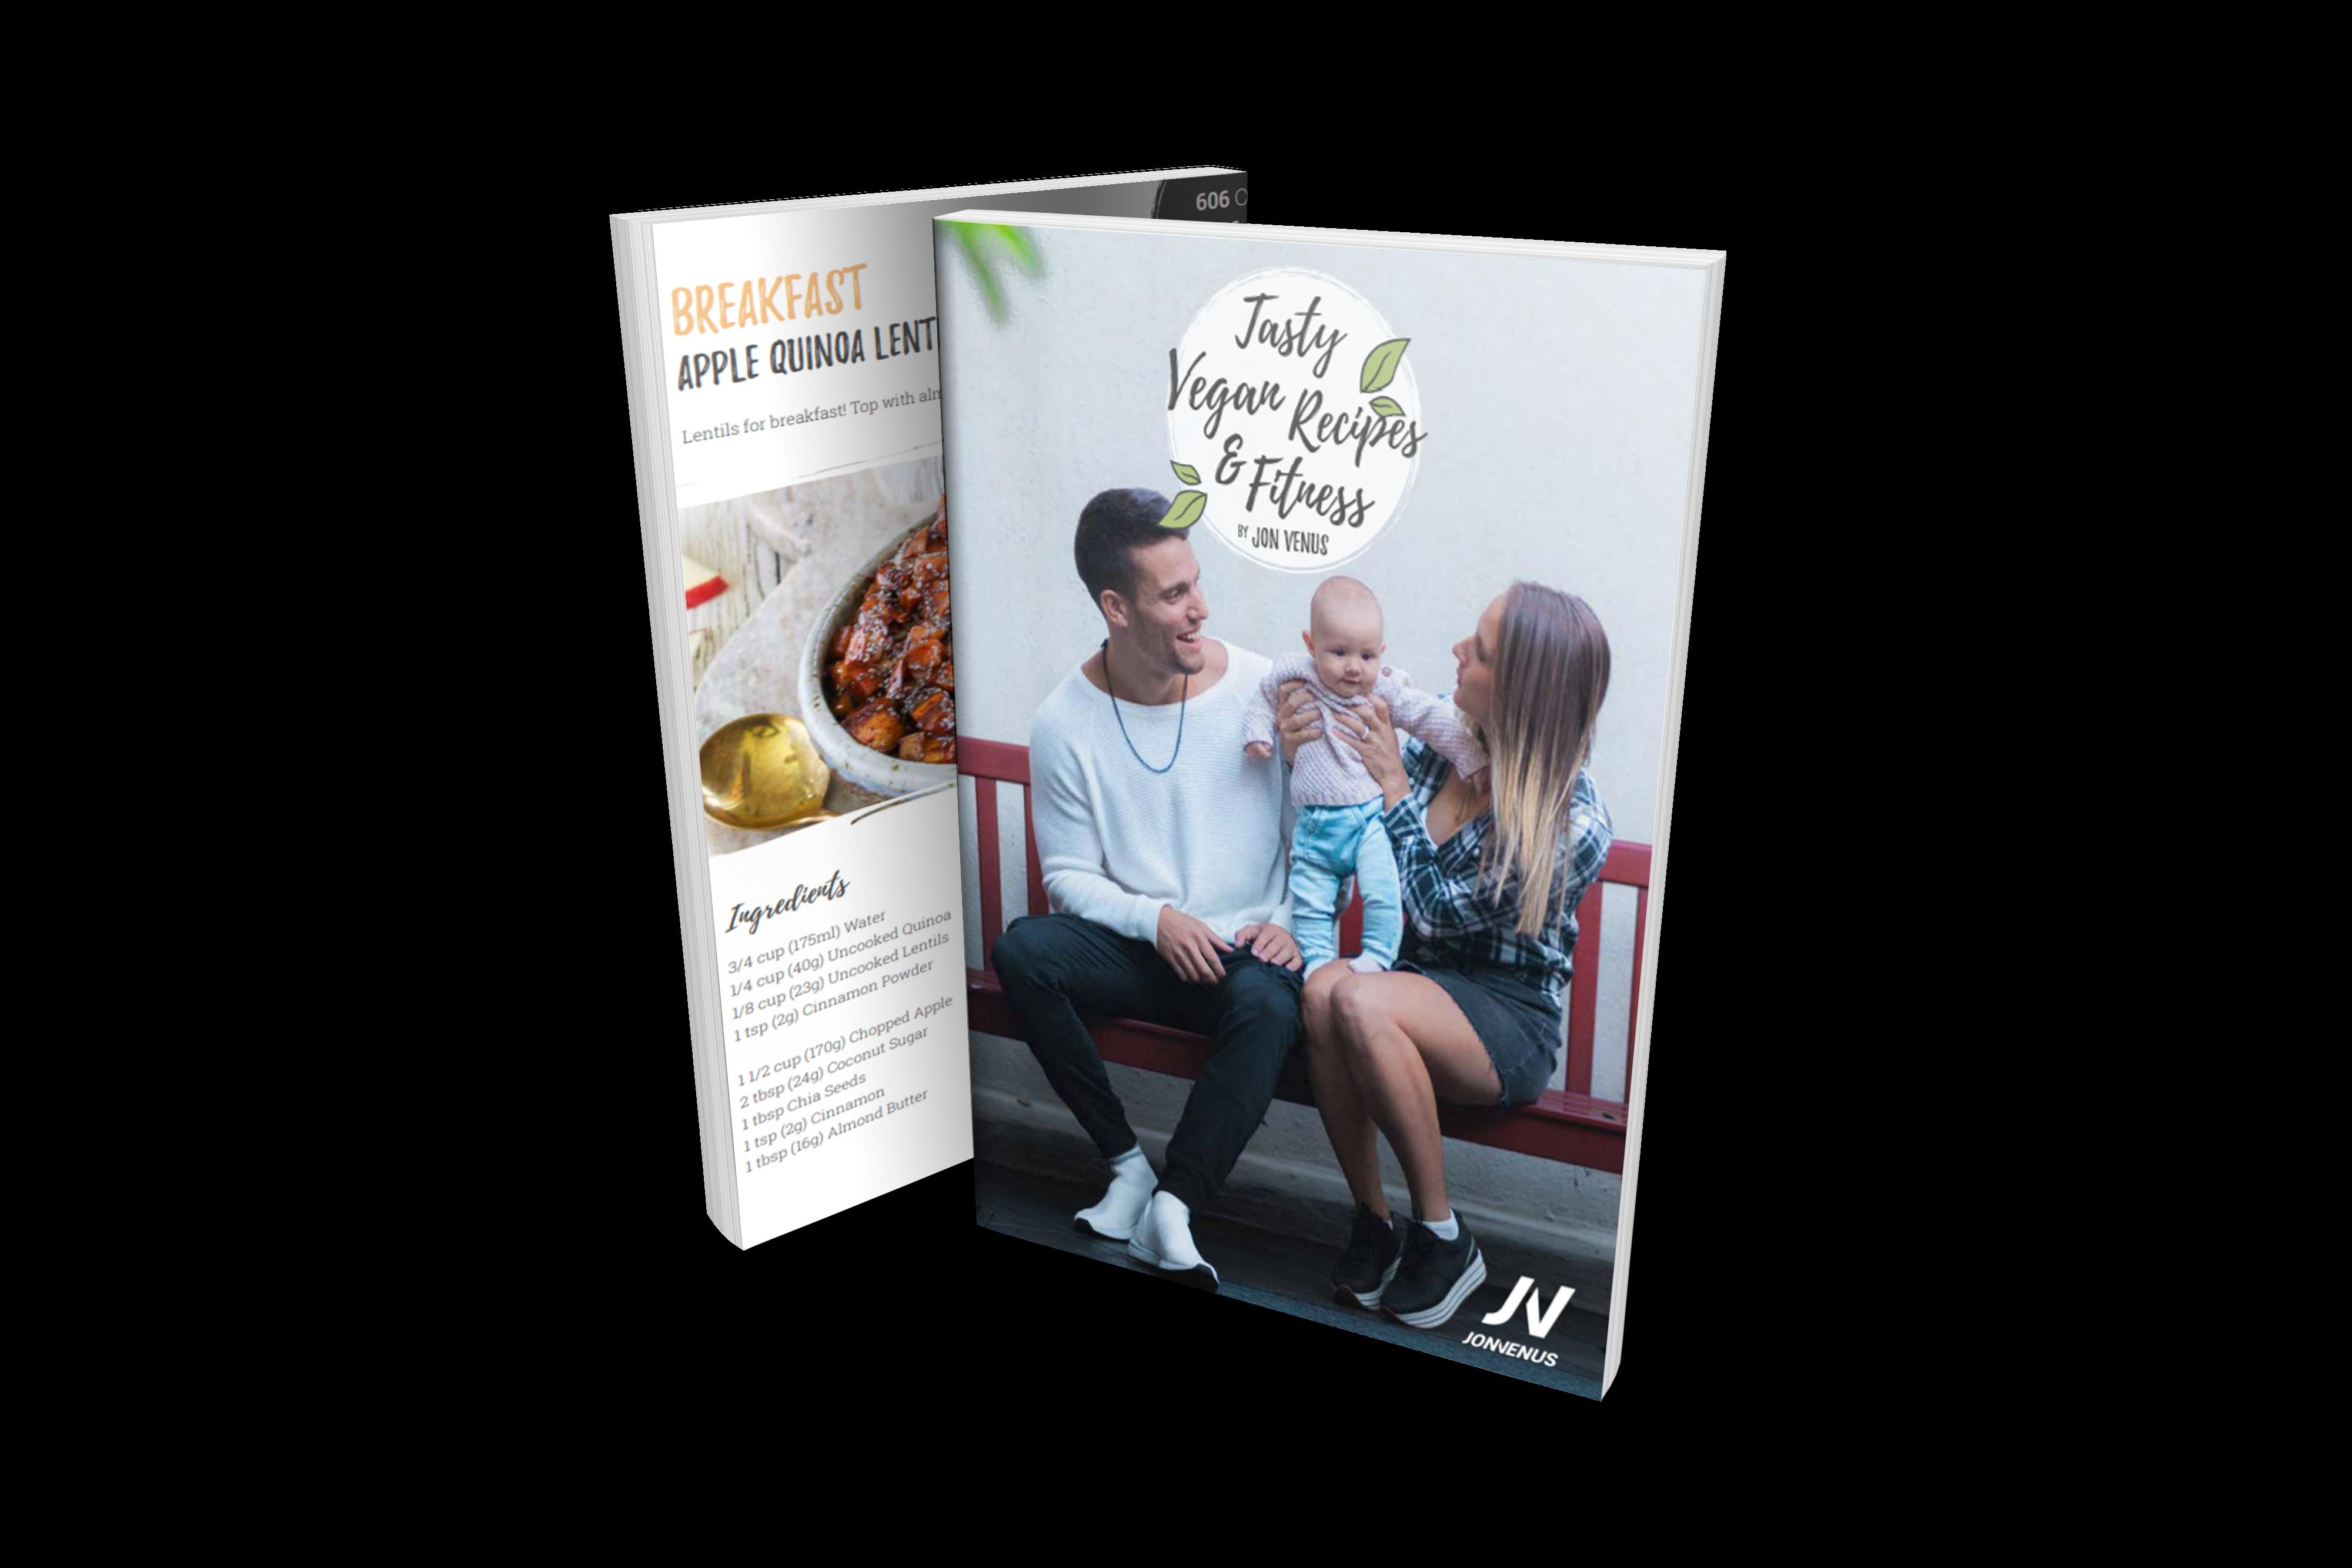 Tasty Vegan Meals Fitness Guide Jon Venus